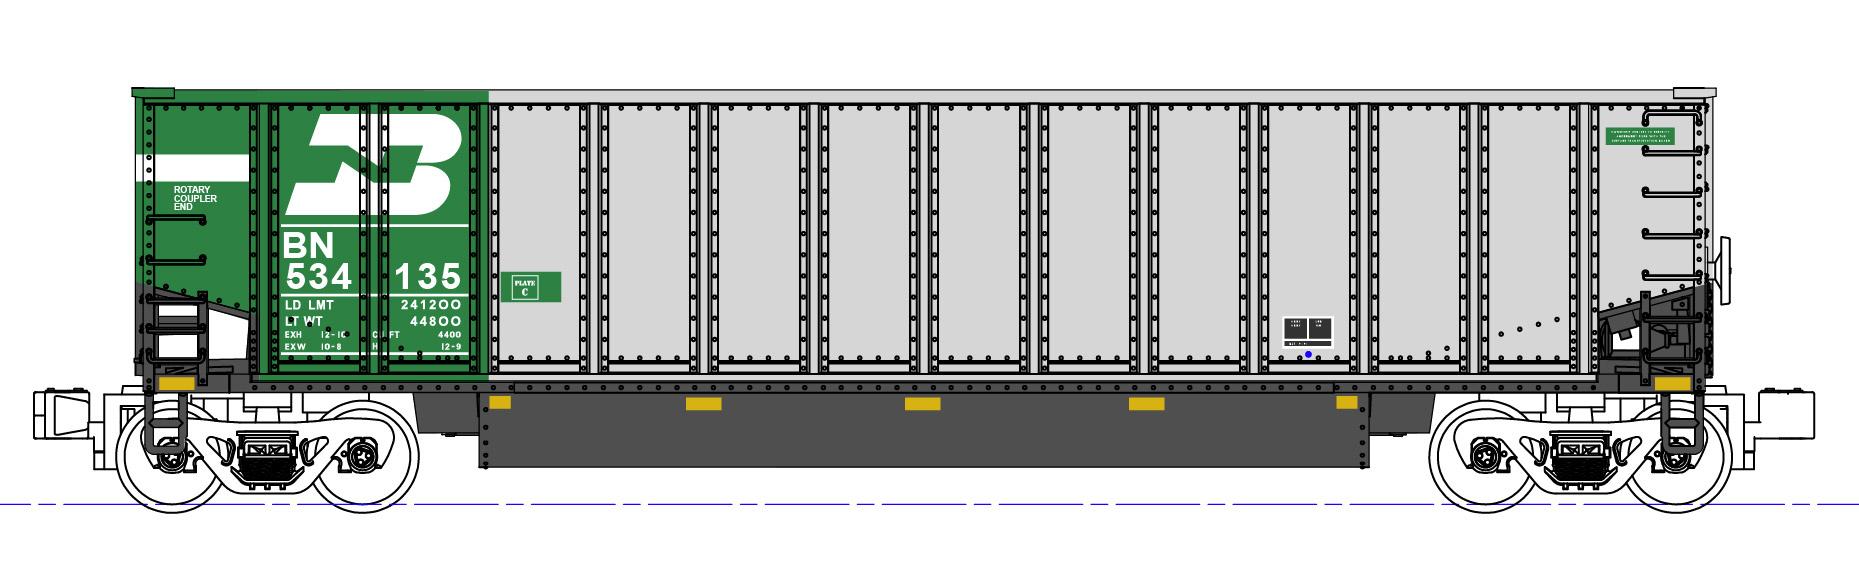 N Scale - Kato USA - 106-4651 - Gondola, Bathtub, Bethgon Coalporter - Burlington Northern -  533999, 534017, 534123, 534329, 534565, 534568, 534596, 534700